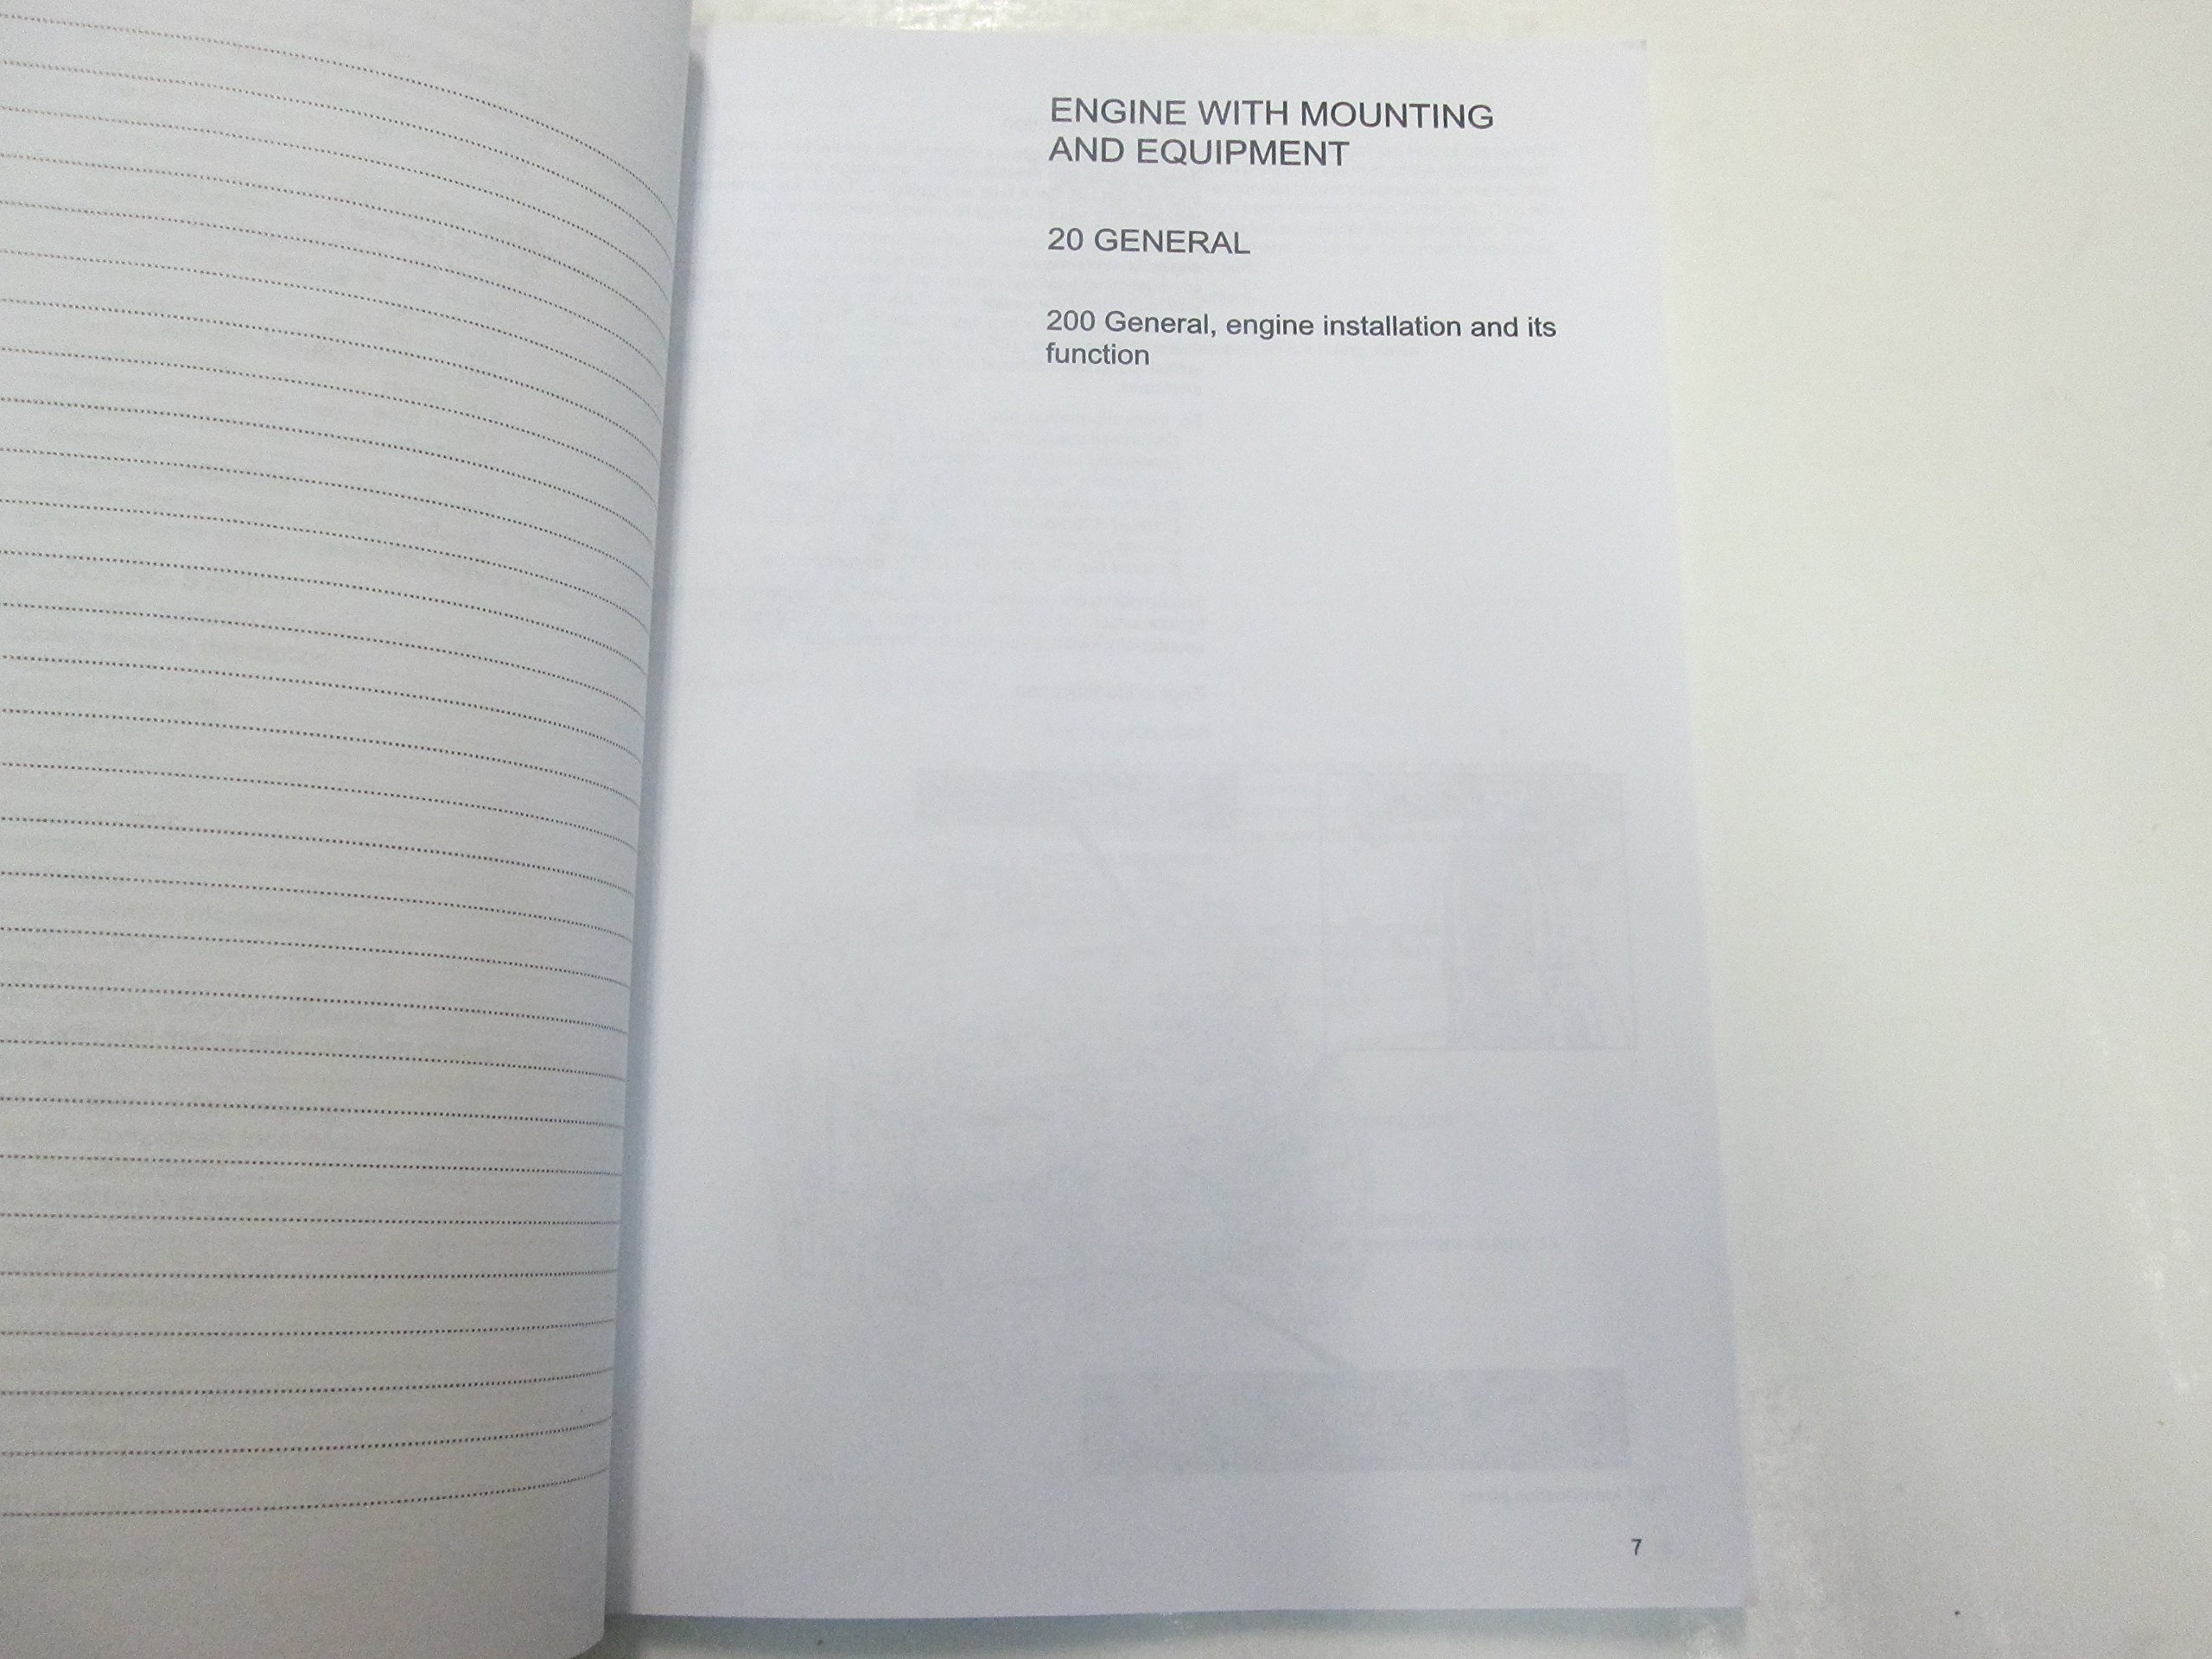 2015 Volvo L60H L70H L90H Engine Descriptions Service Manual ...